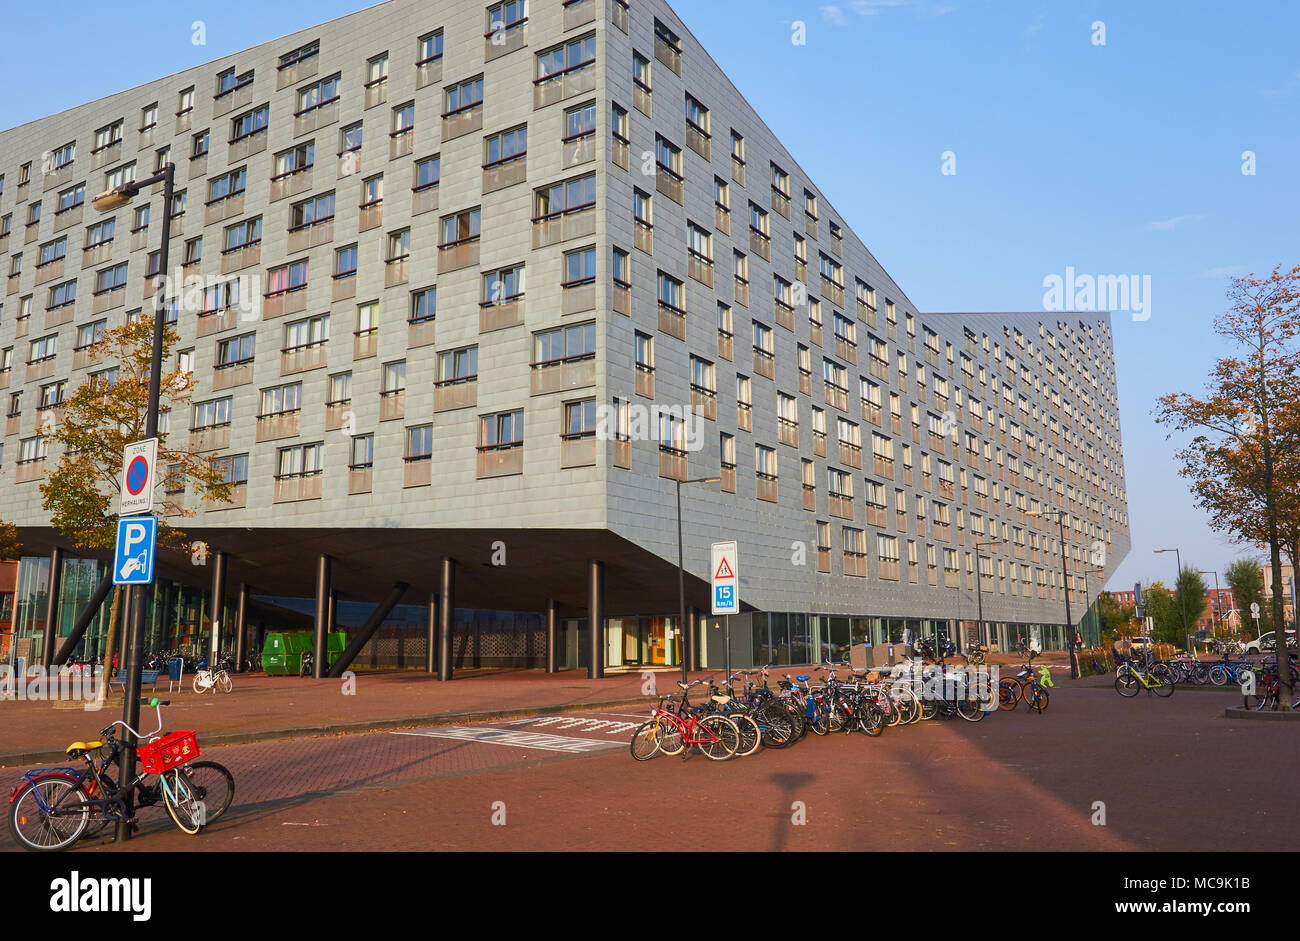 The Whale housing project, Borneo-Sporenburg, Amsterdam, Netherlands. Stock Photo